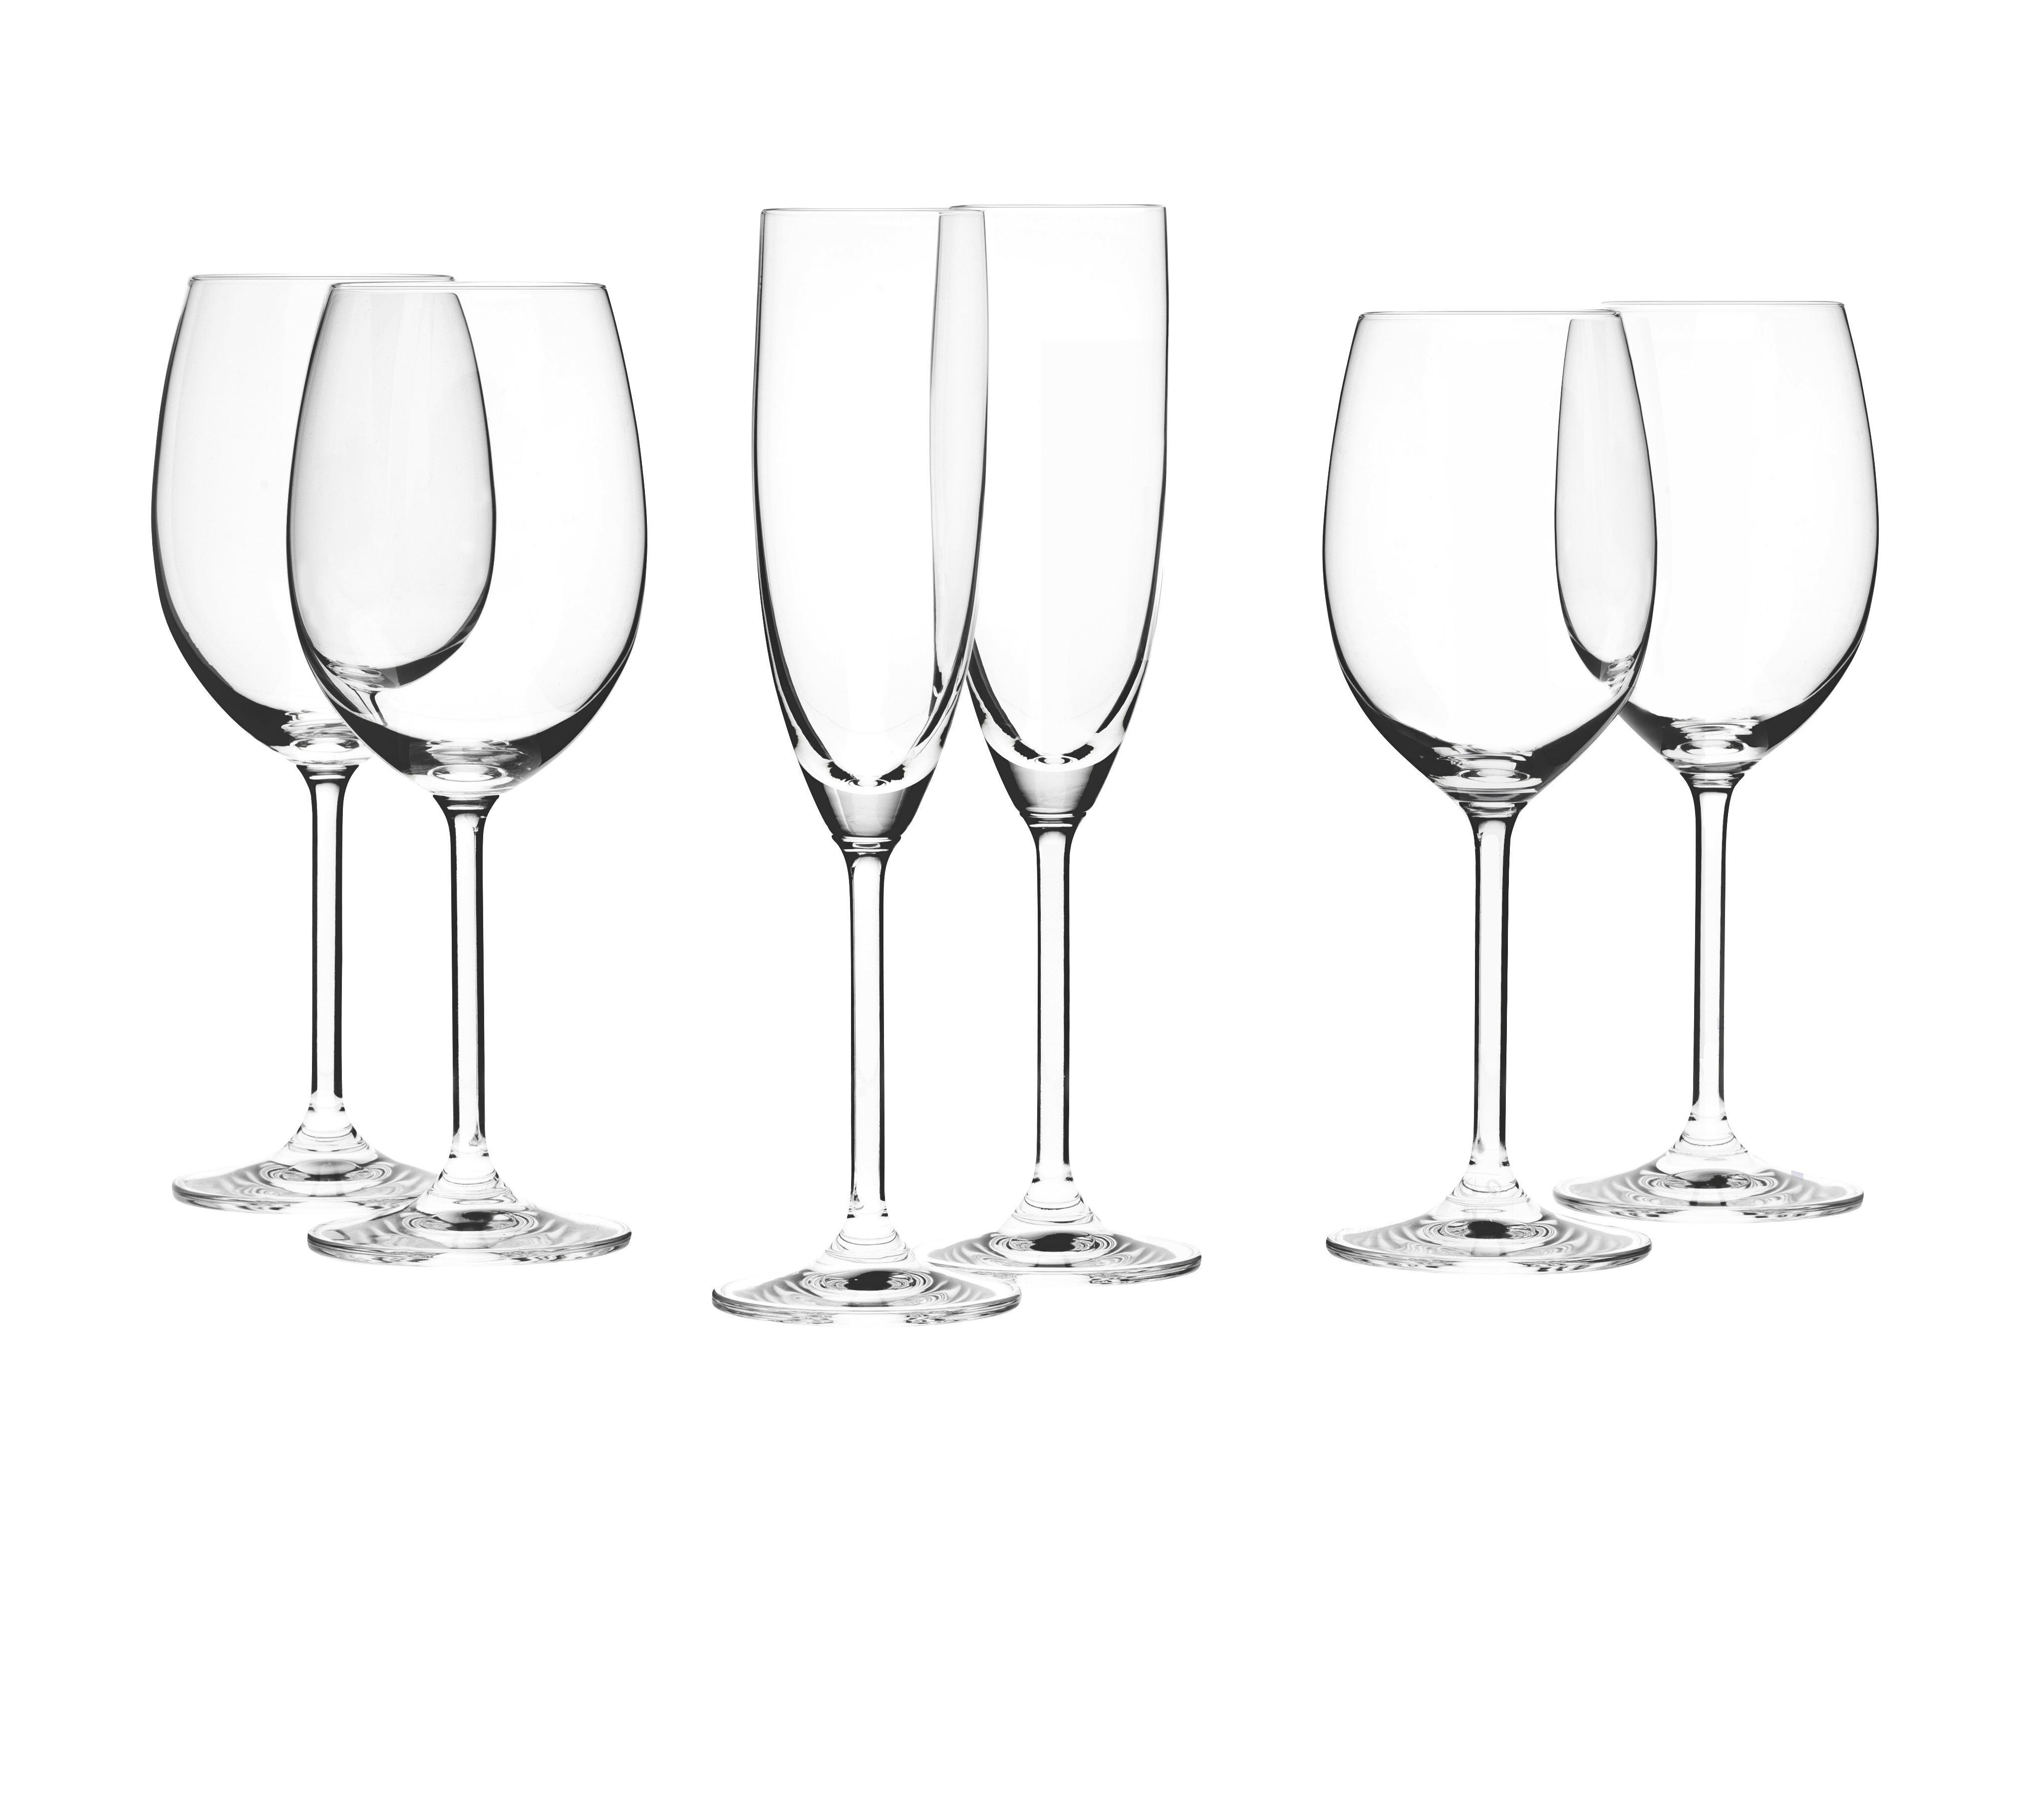 GLÄSERSET 12-teilig - Klar, Basics, Glas - LEONARDO